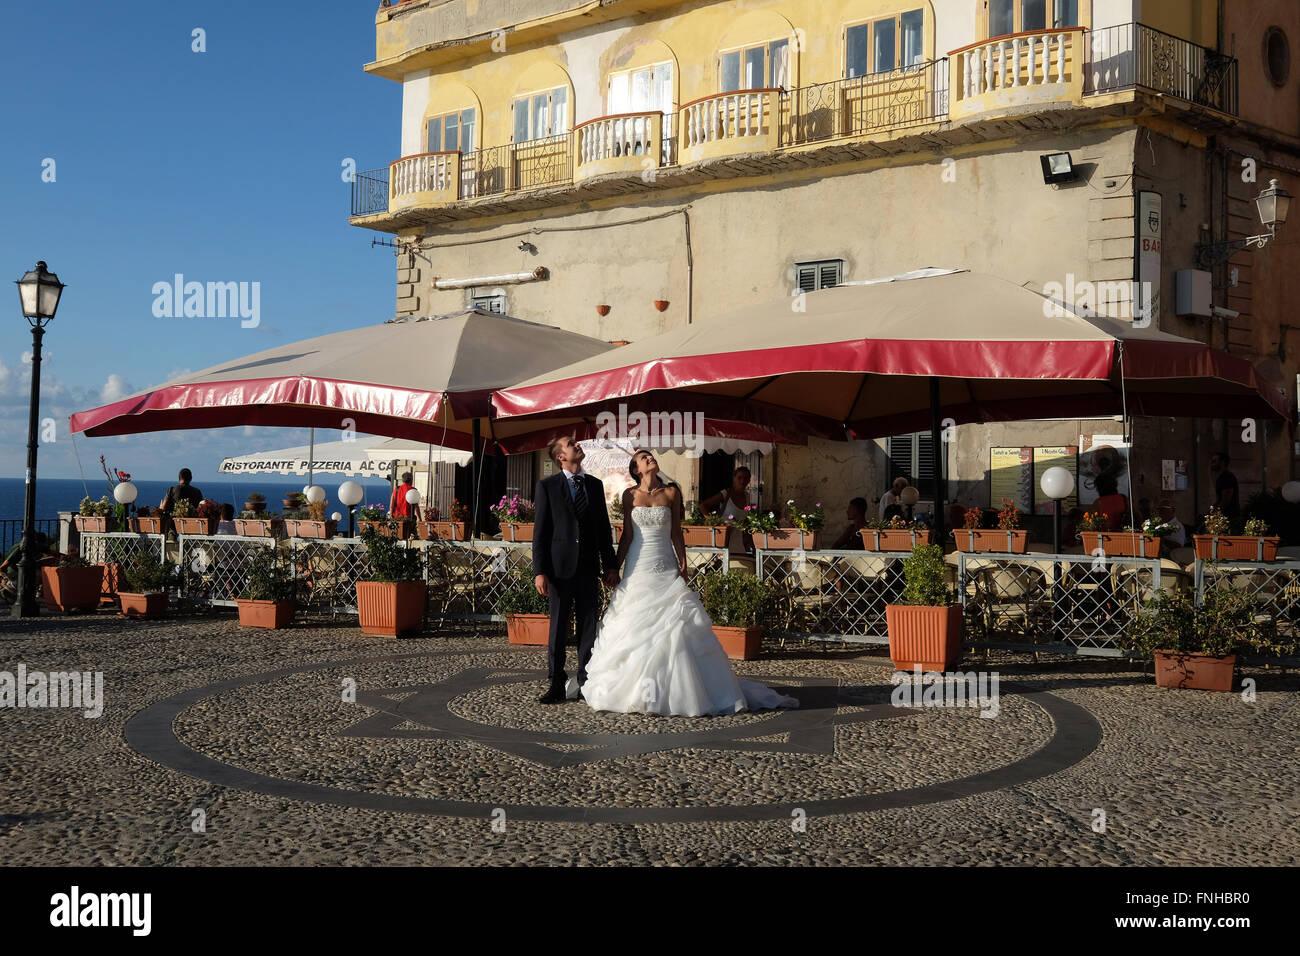 wedding in Tropea,Calabria,Italy - Stock Image